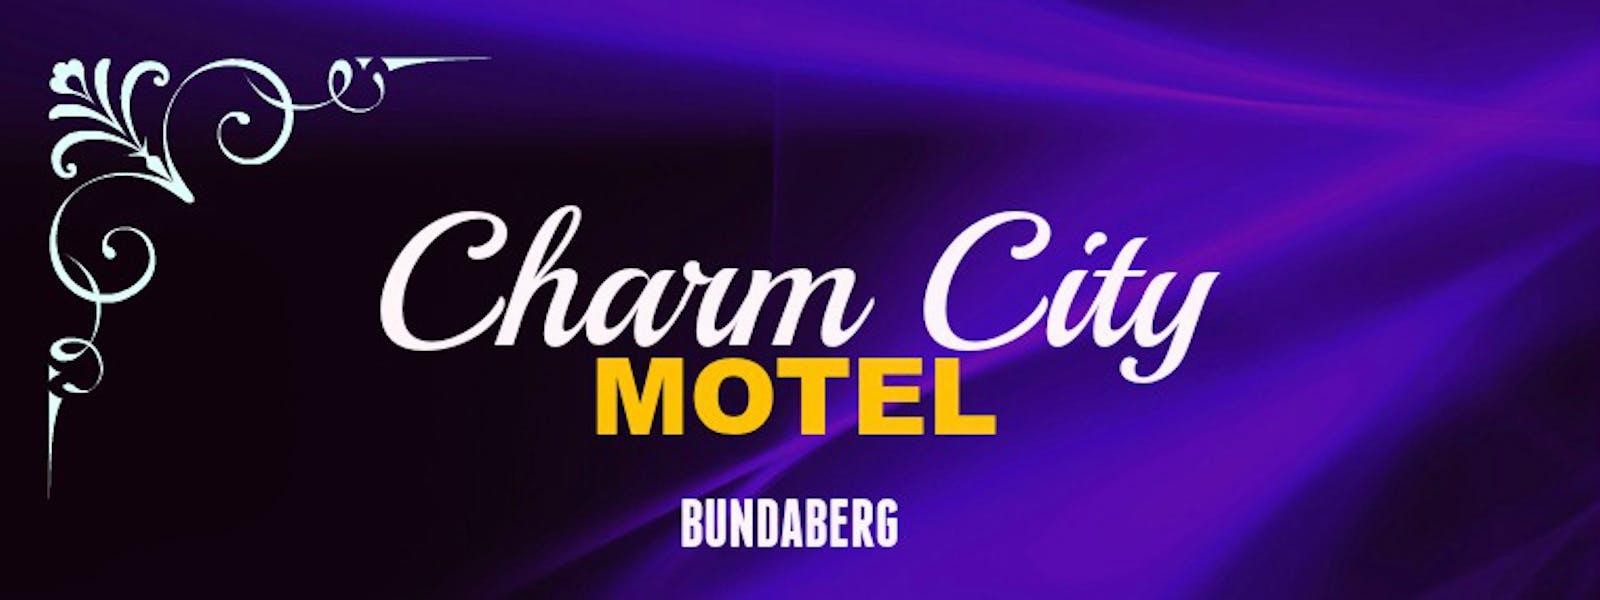 Home Charm City Motel Bundaberg